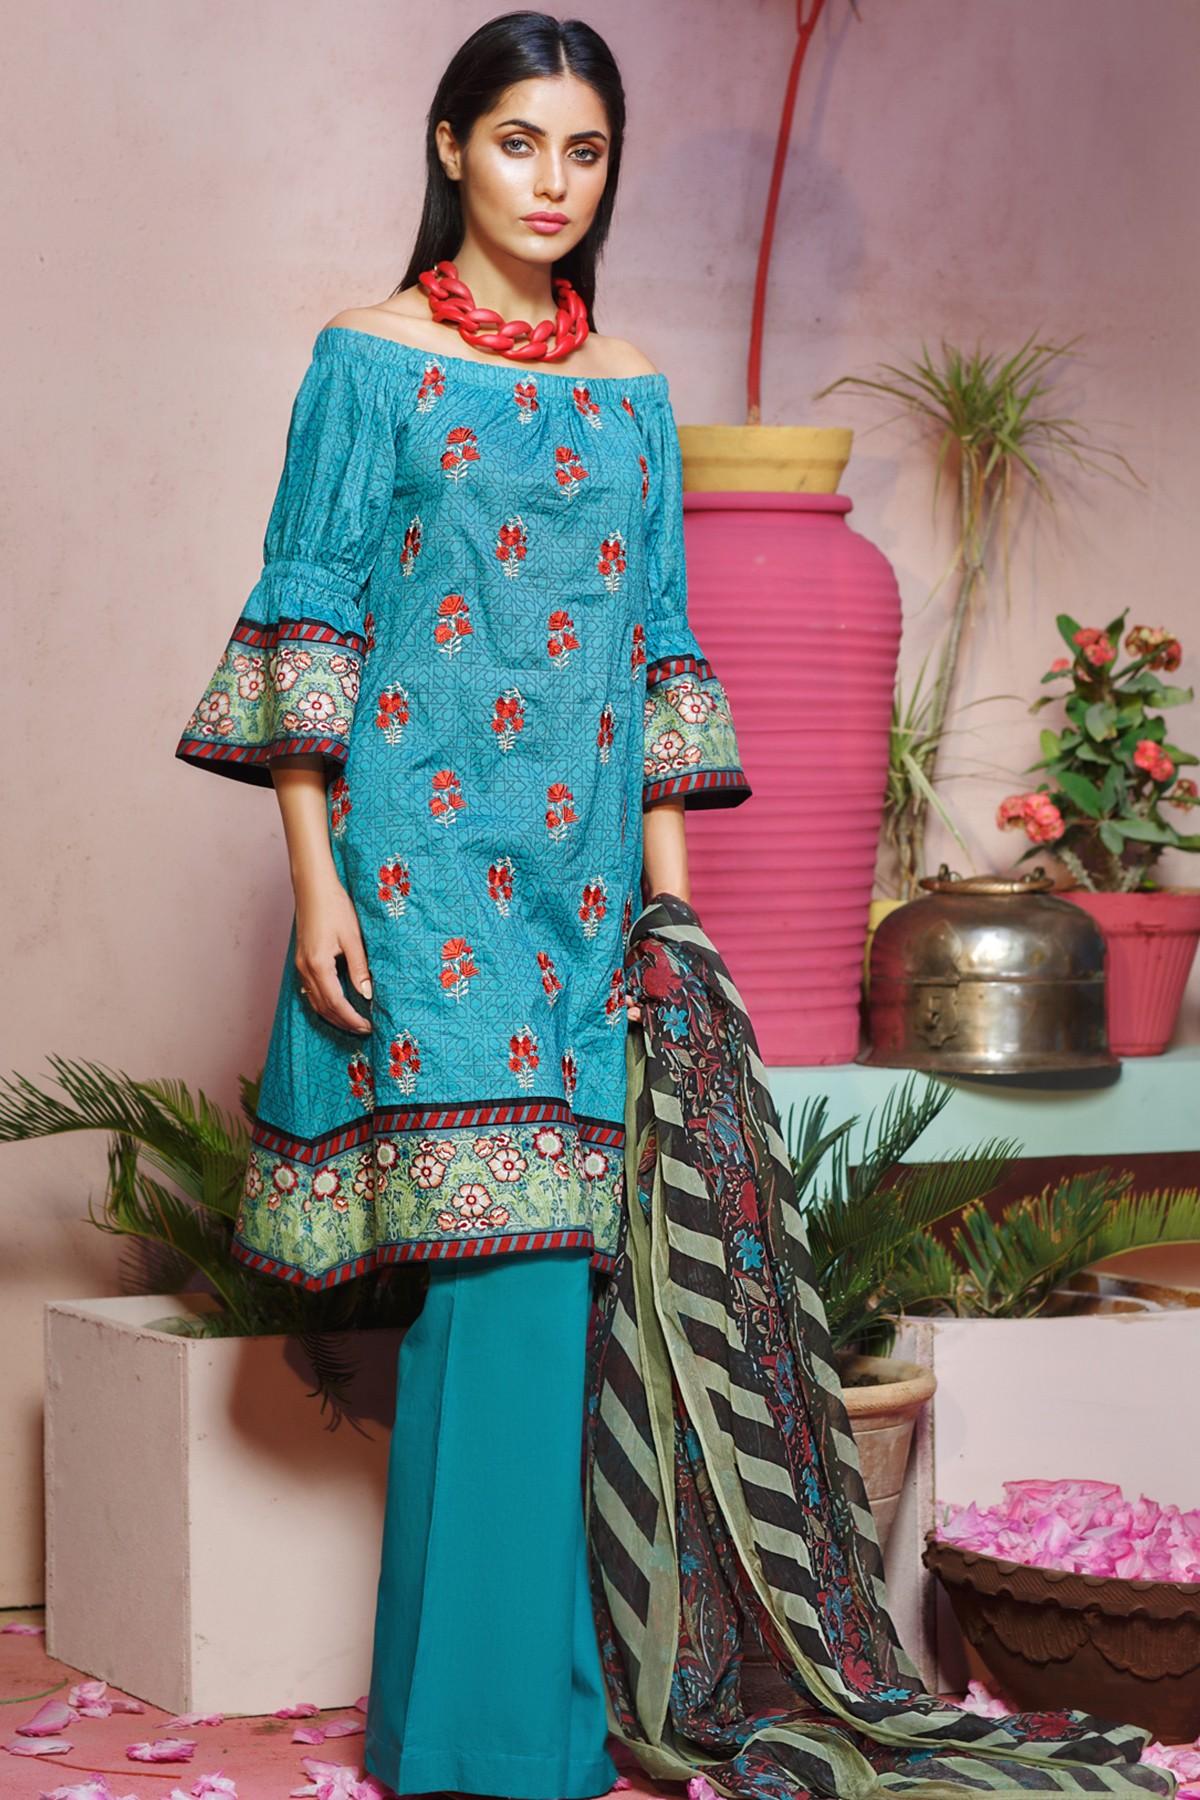 Khaadi Lawn Chiffon Eid Dresses Designs Collection 2017 2018